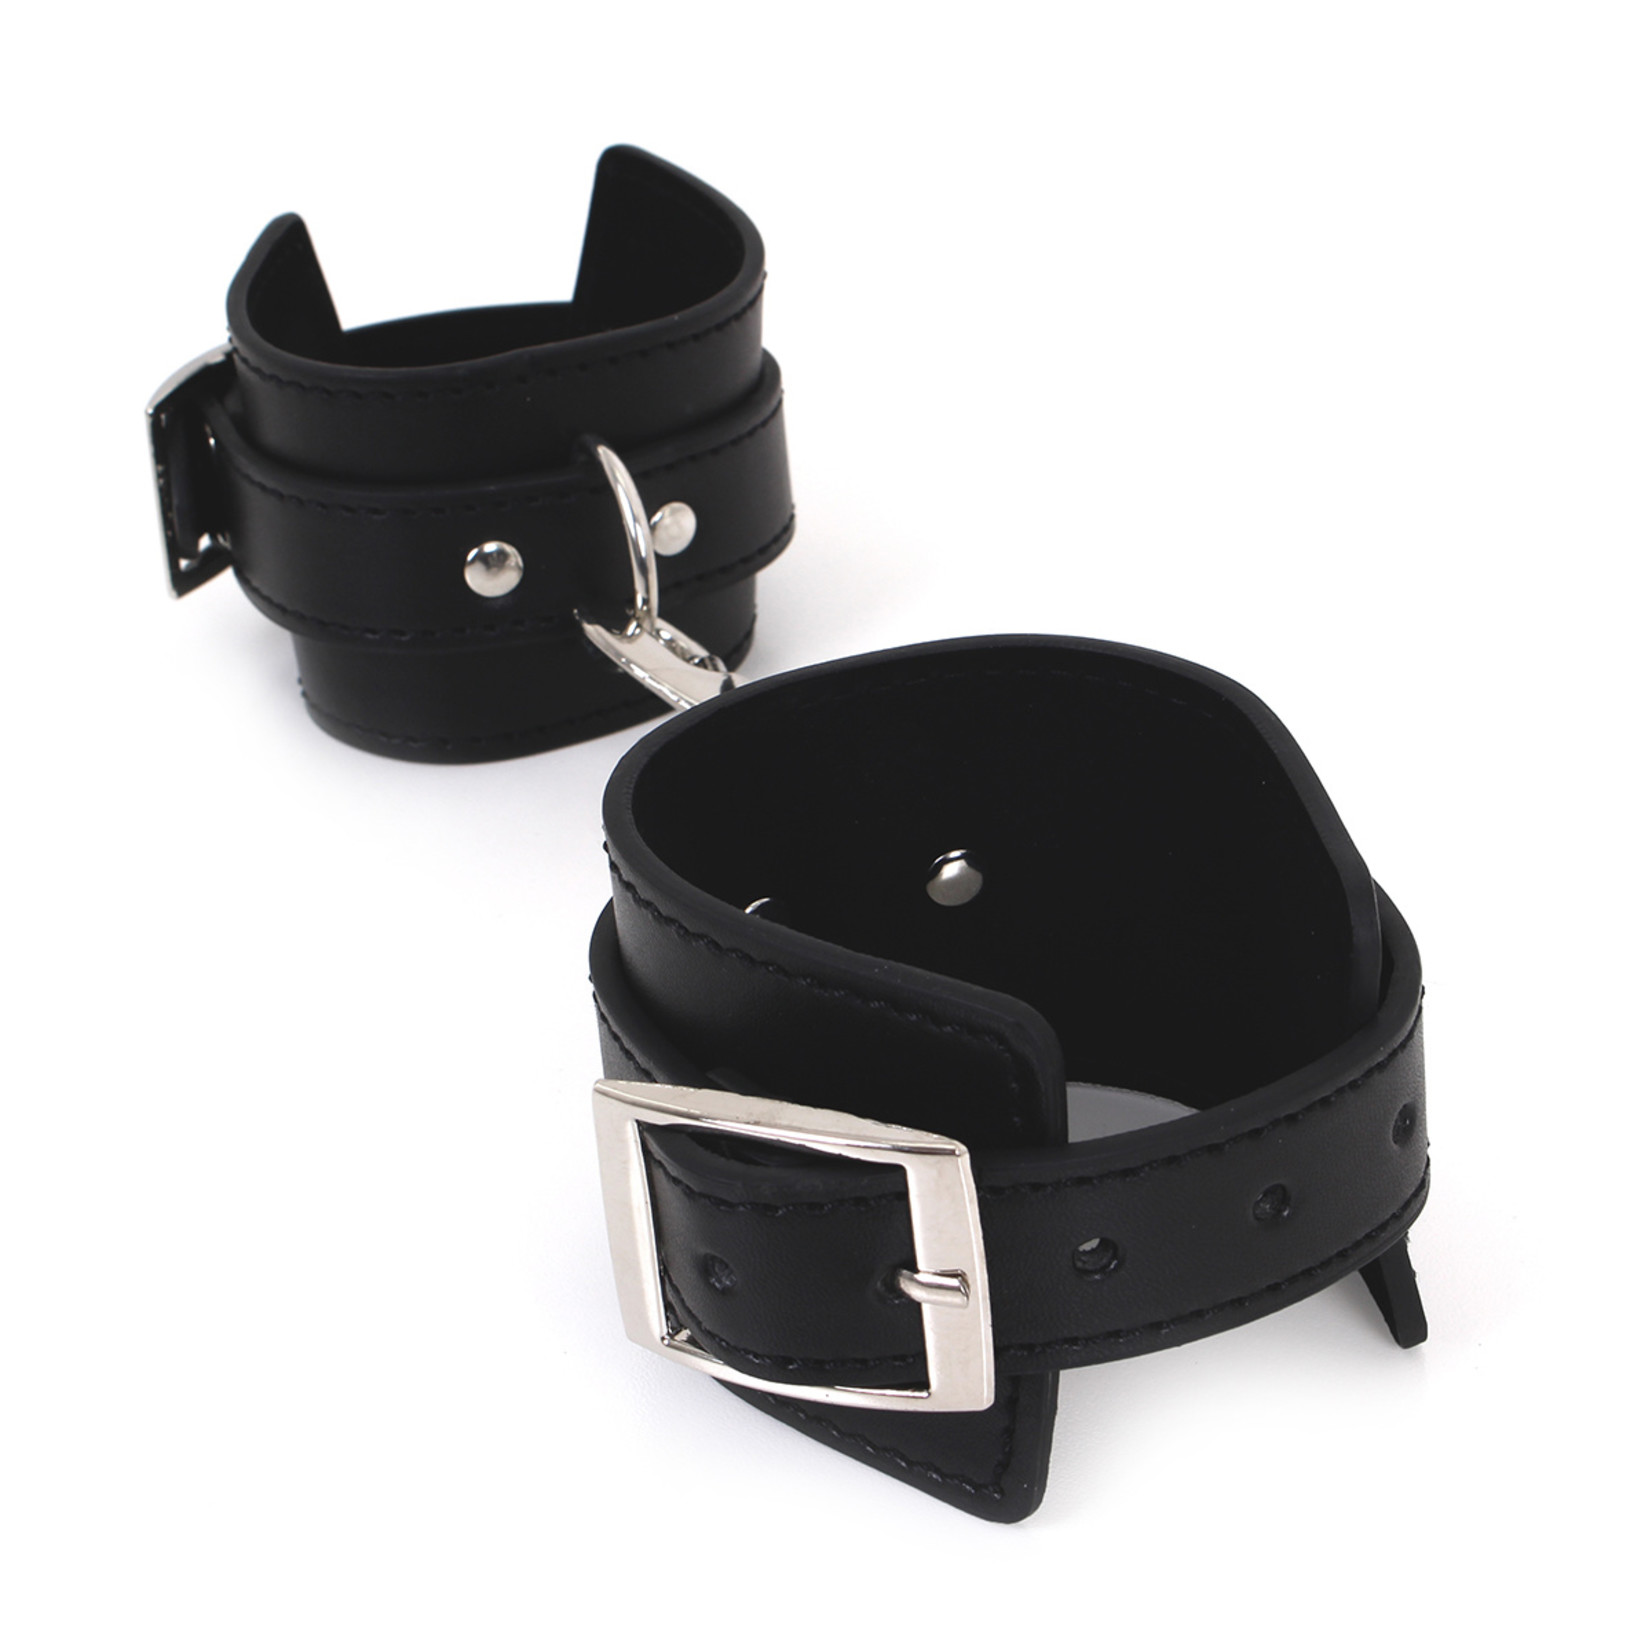 KIOTOS Leather Budget Wrist Cuffs met Double Hook